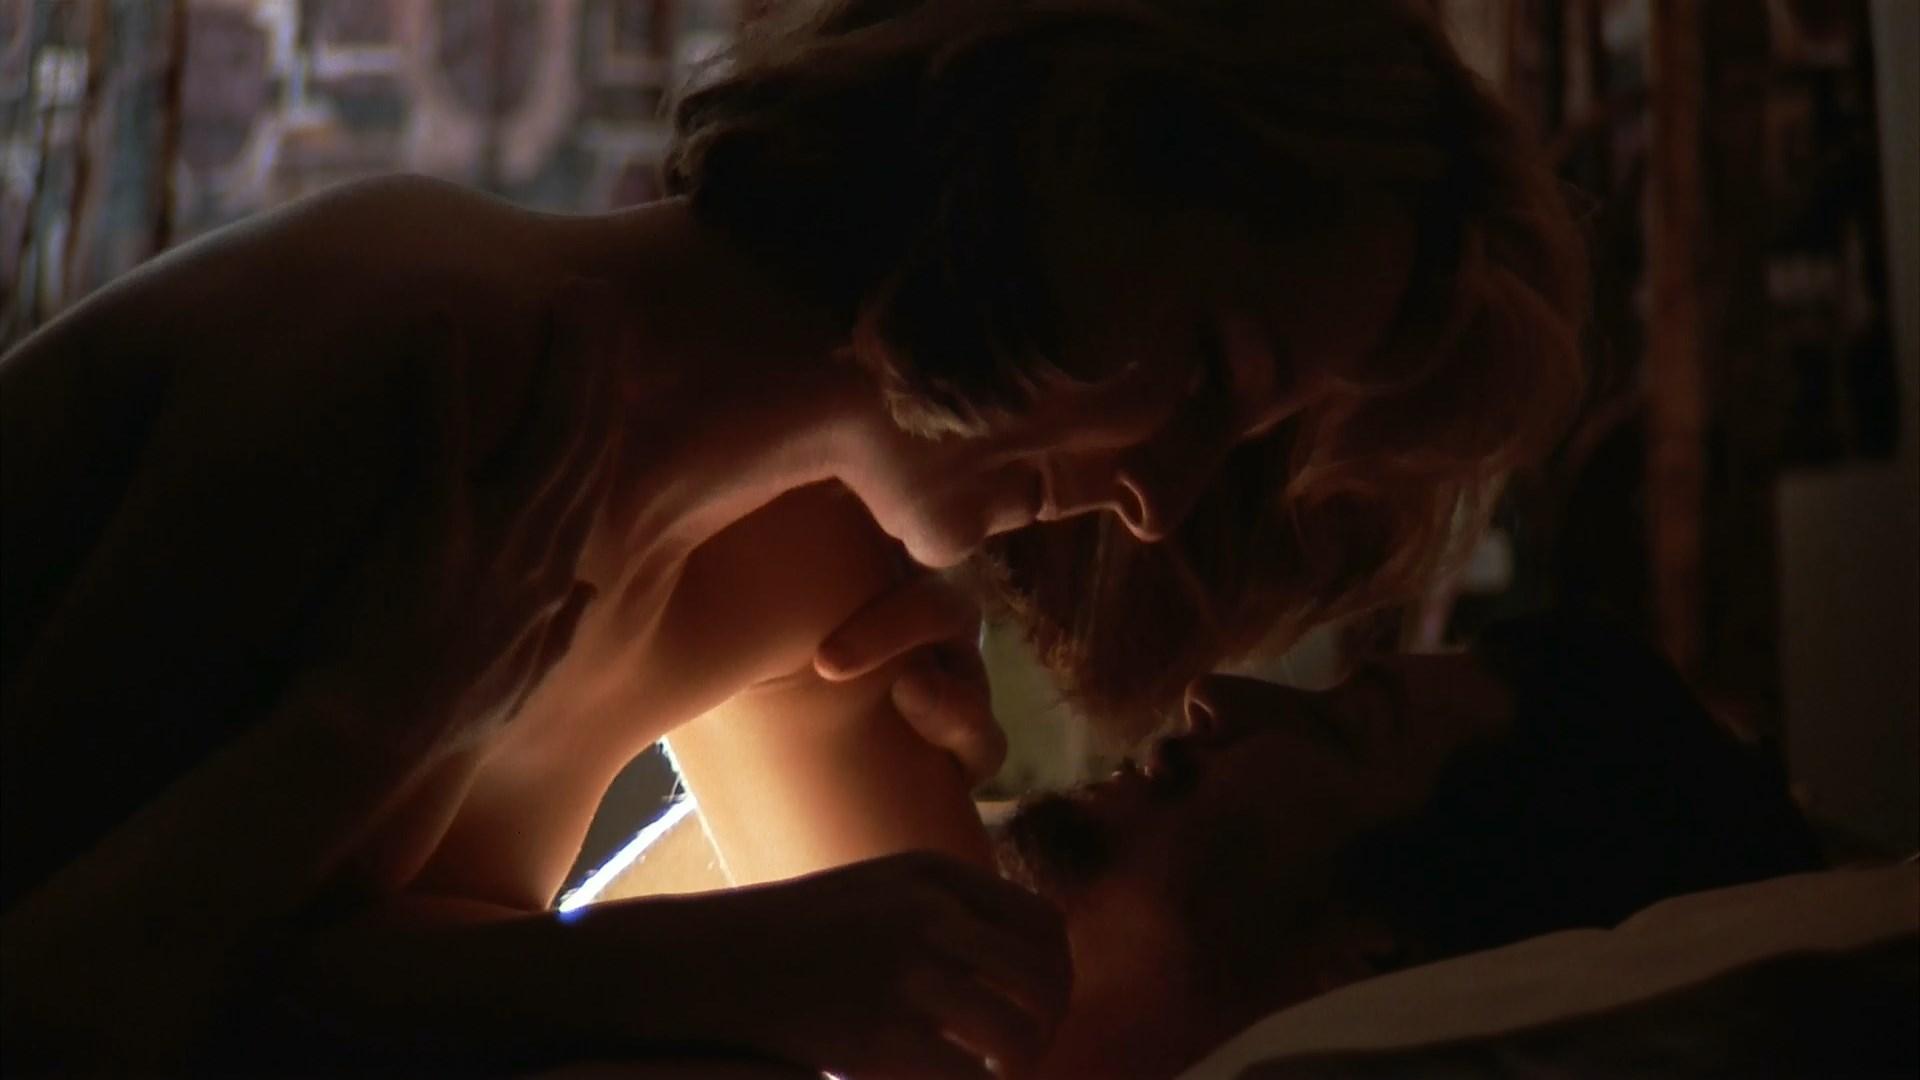 Drunk girls nude video